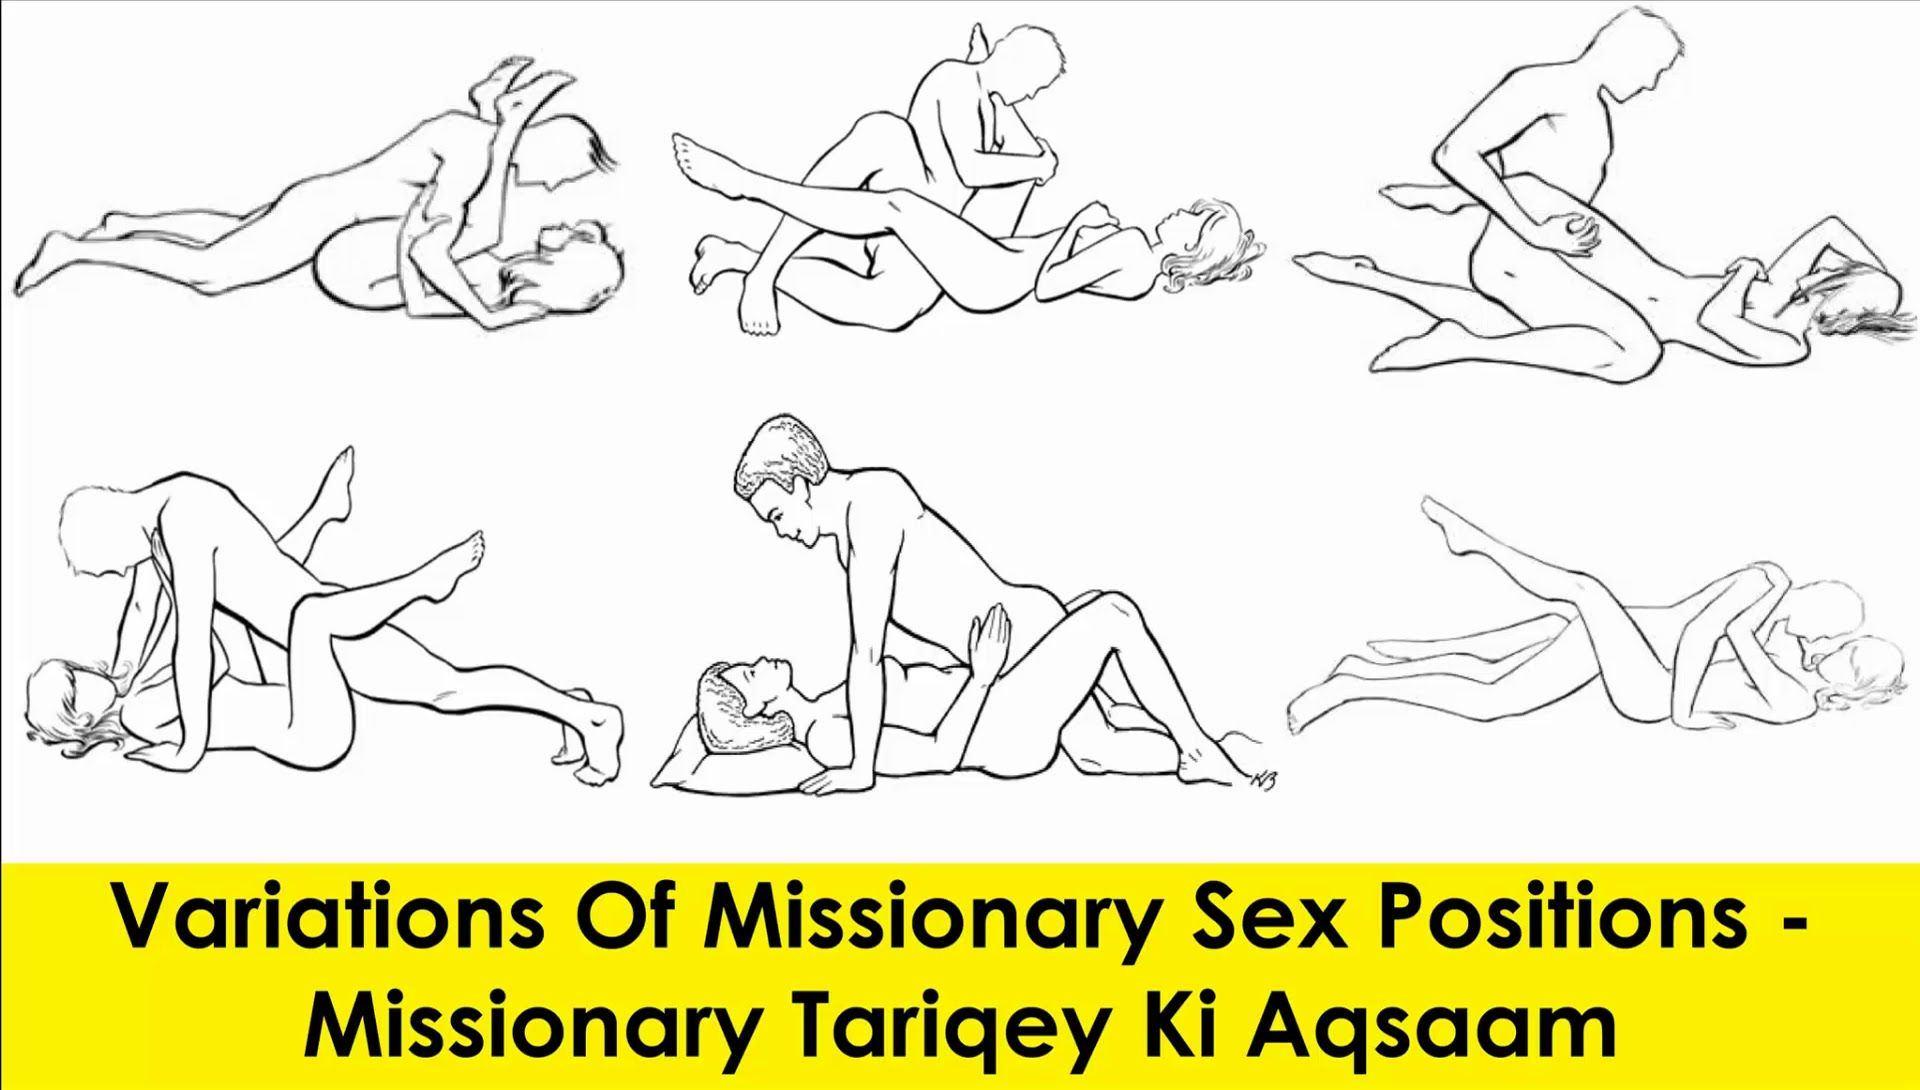 Missionary sex pose